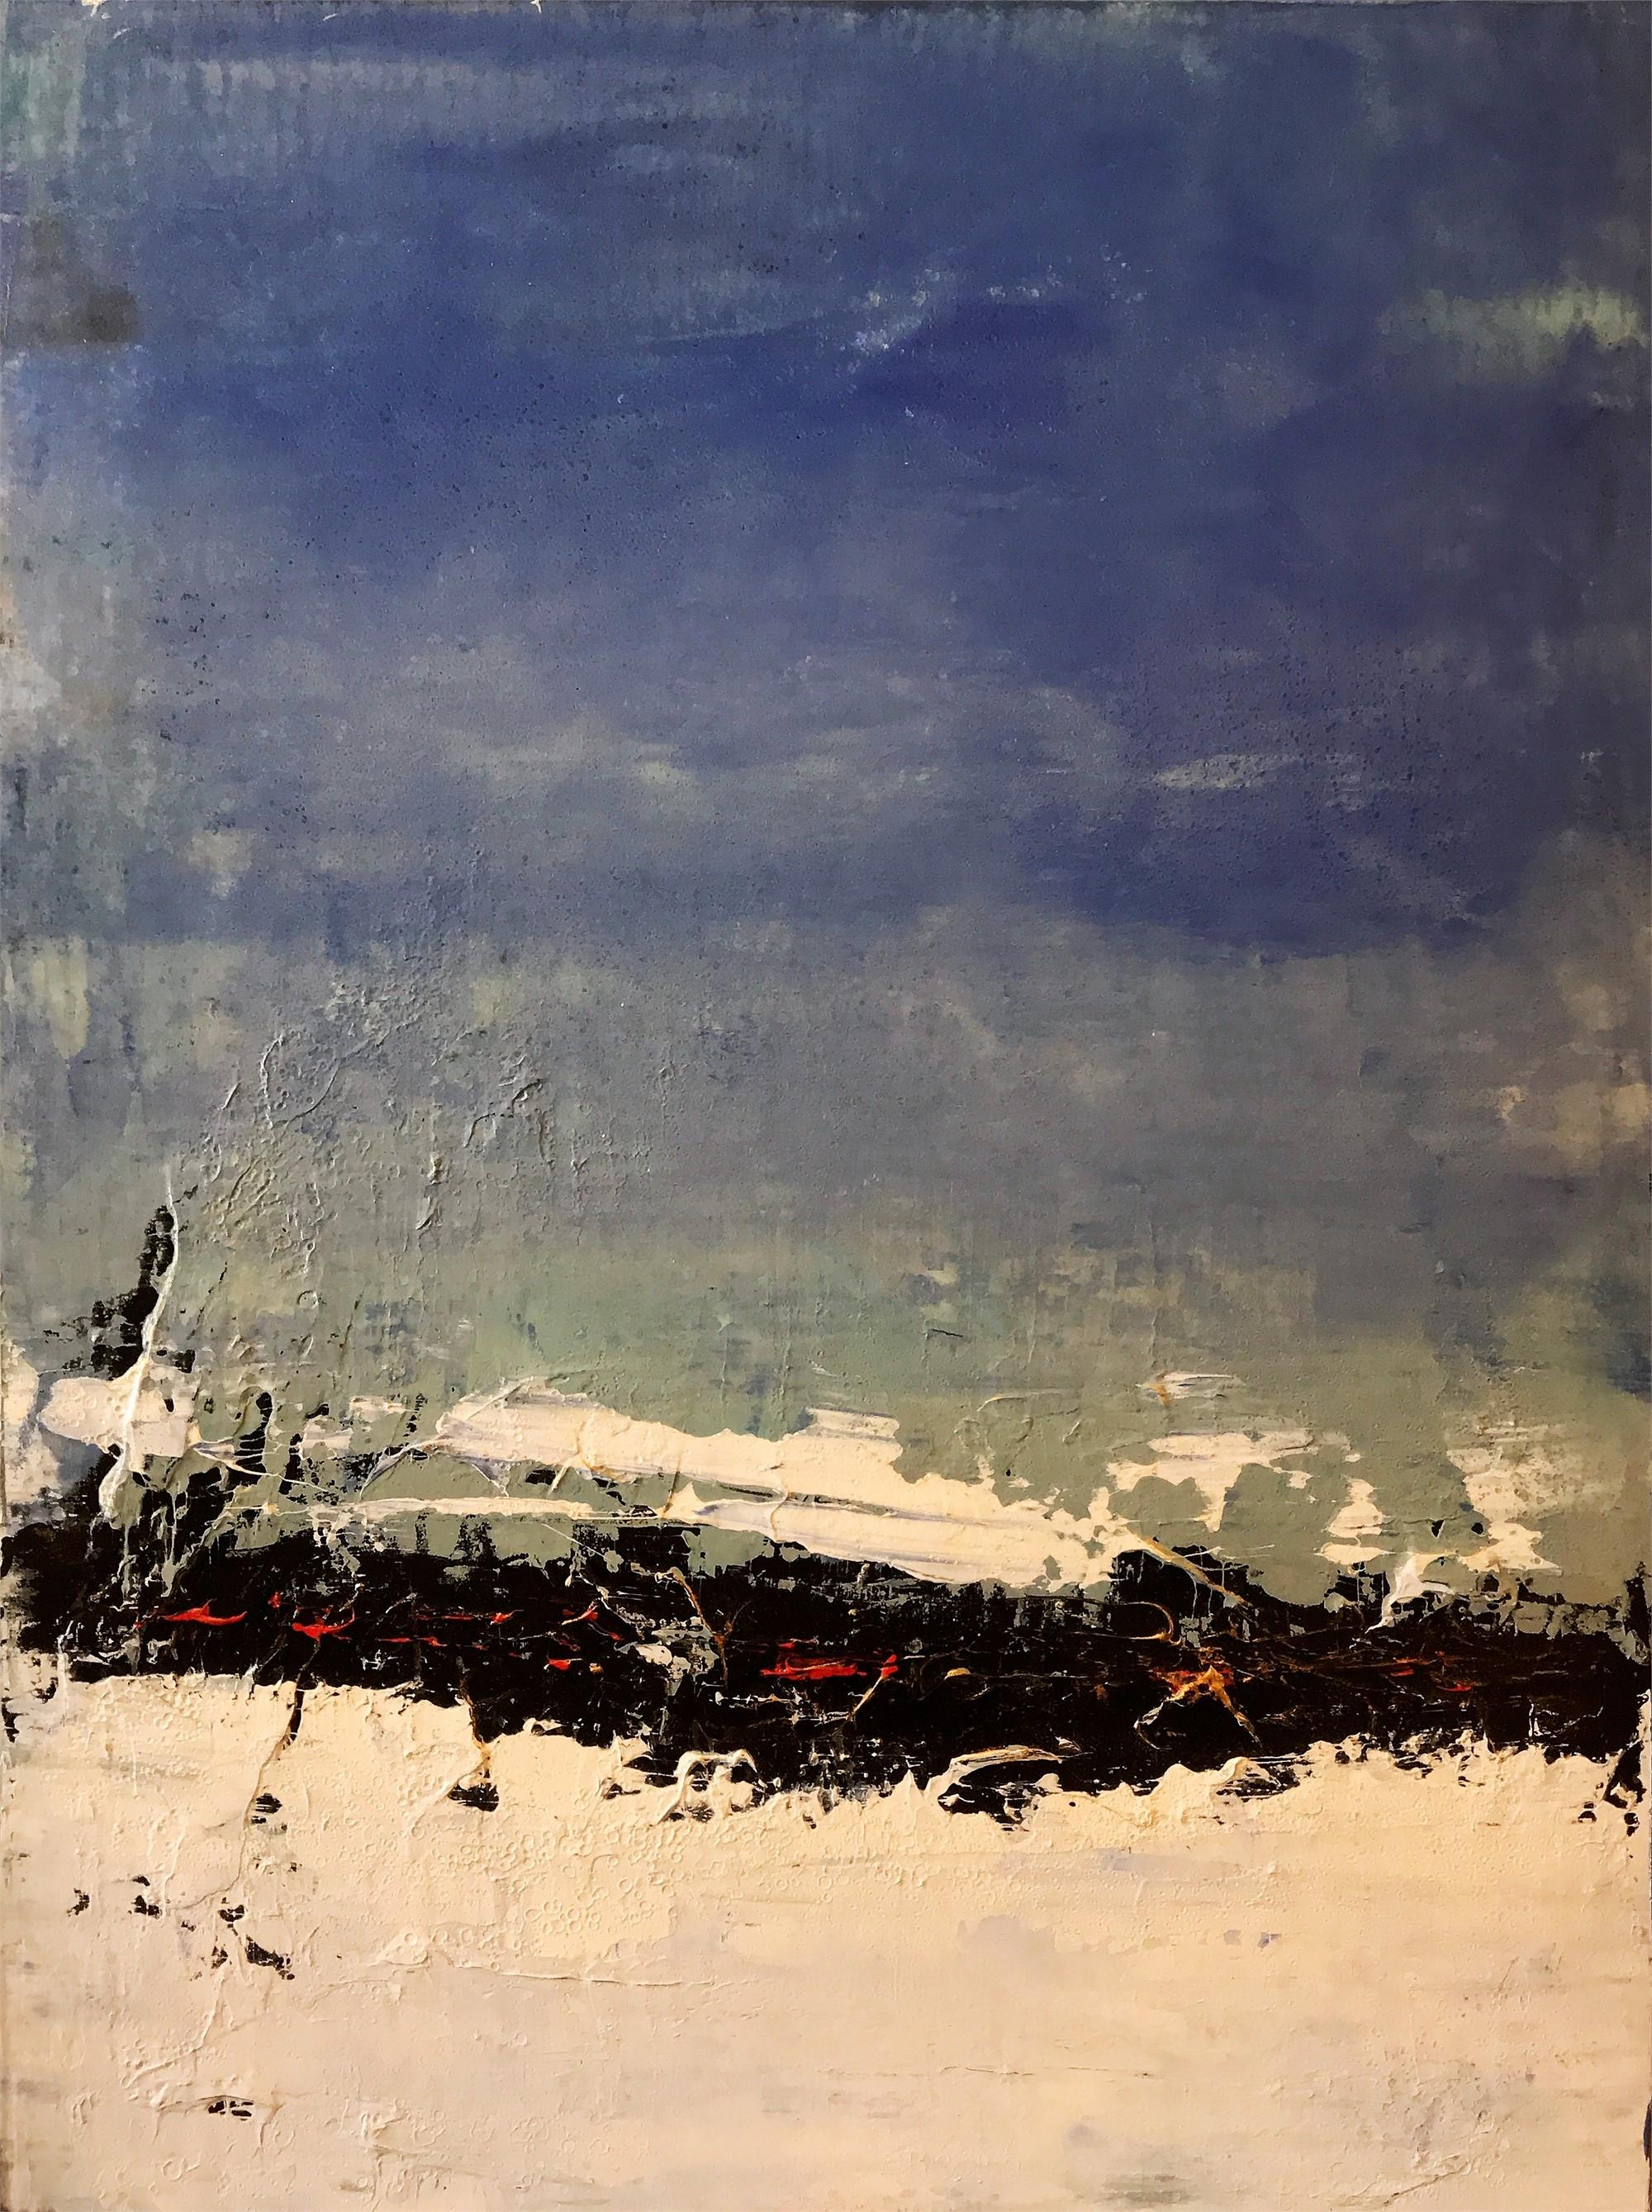 Blue Skies, 2018 by Brad Robertson